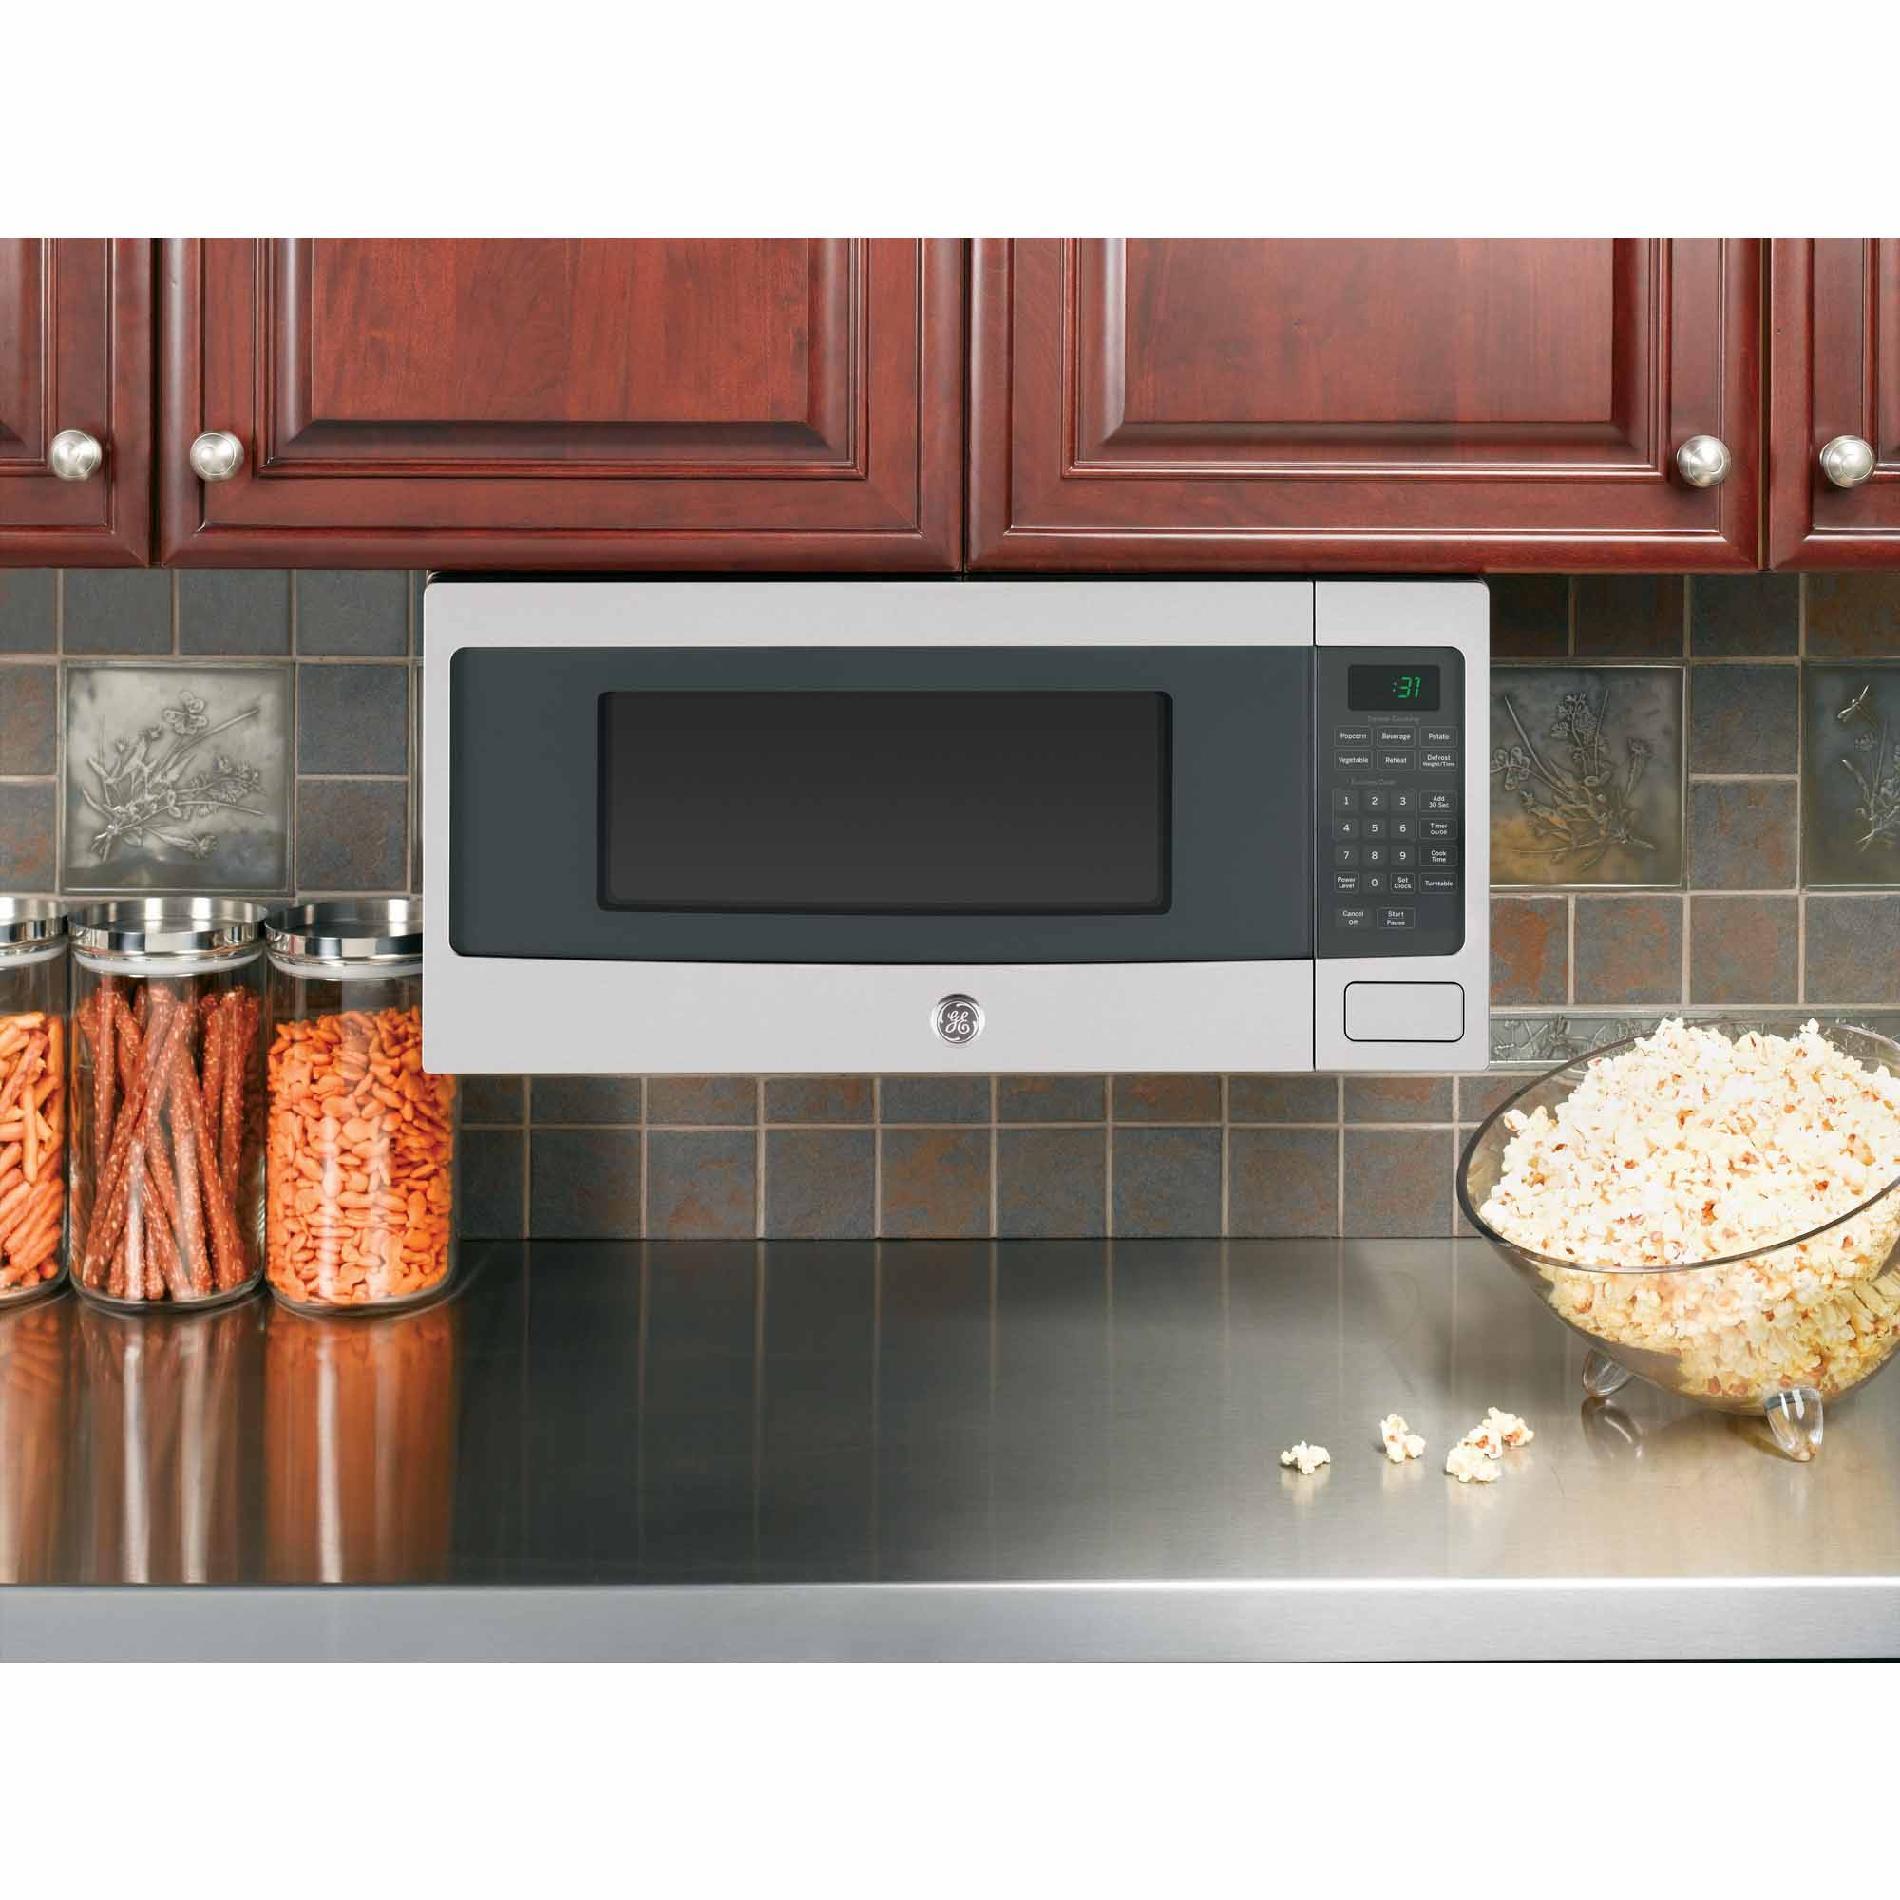 ge profile series pem31sfss 1 1 cu ft countertop microwave oven stainless steel